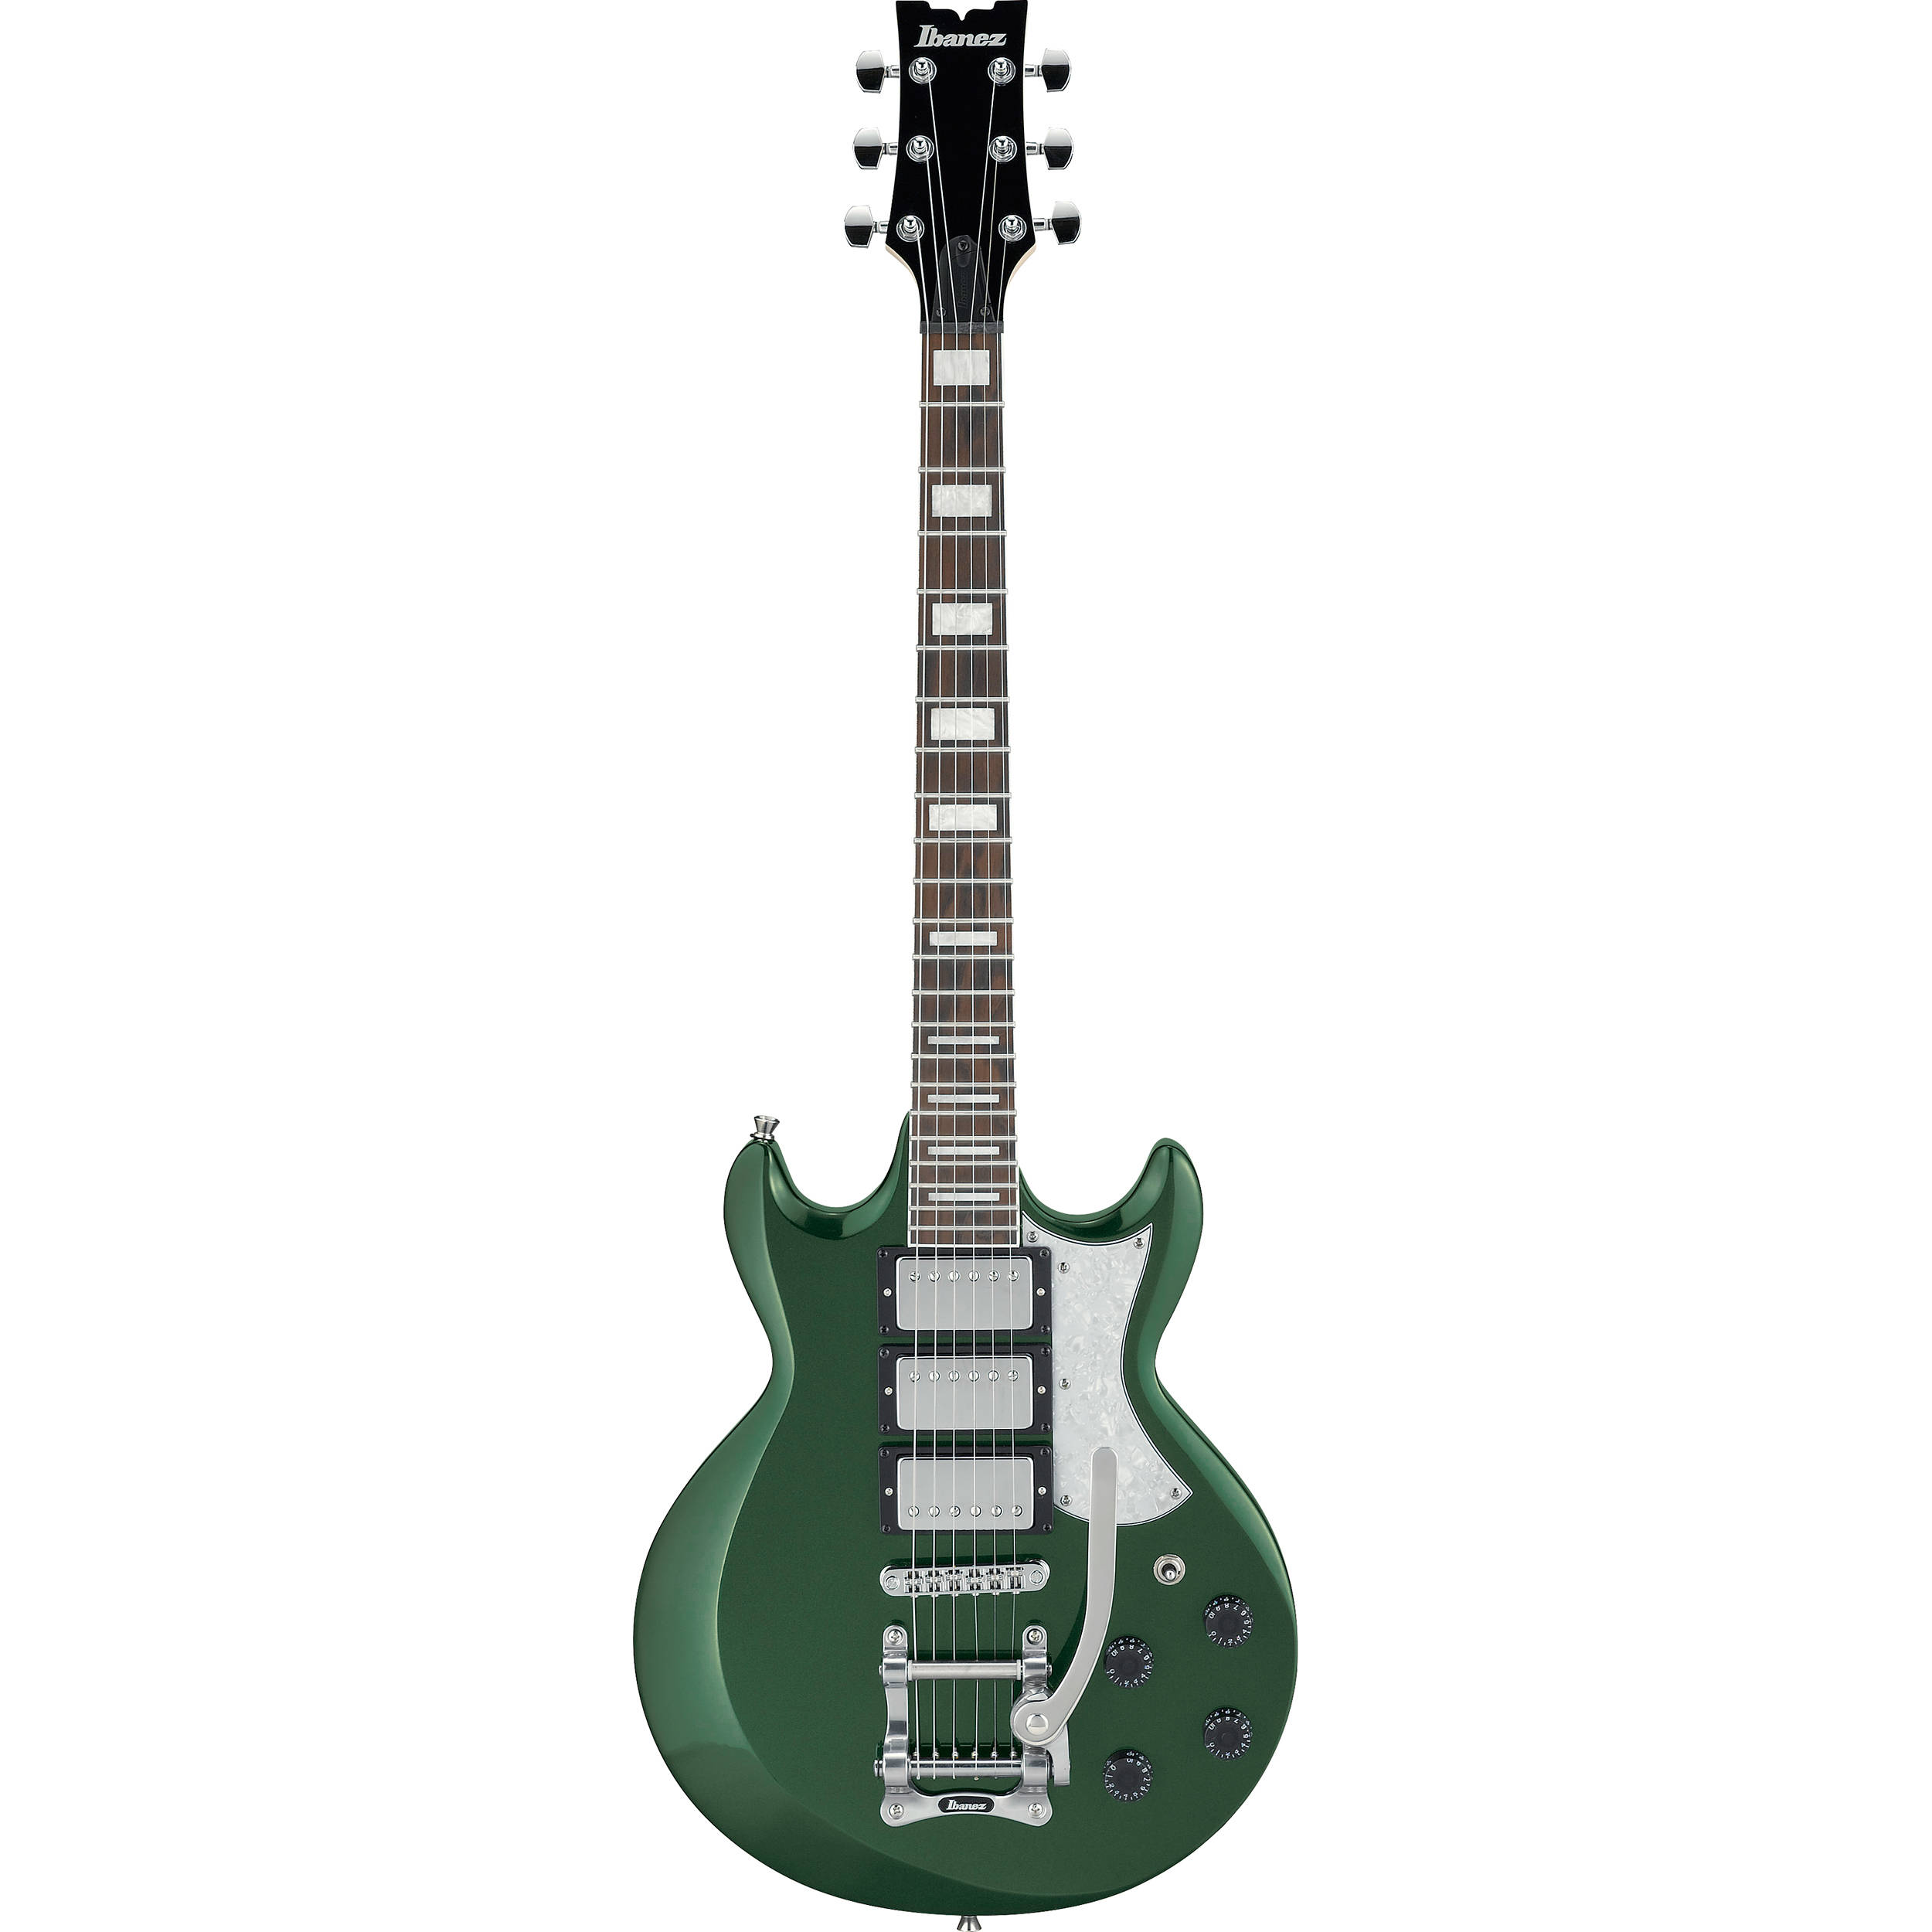 ibanez ax230t ax series electric guitar ax230tmft b h photo. Black Bedroom Furniture Sets. Home Design Ideas